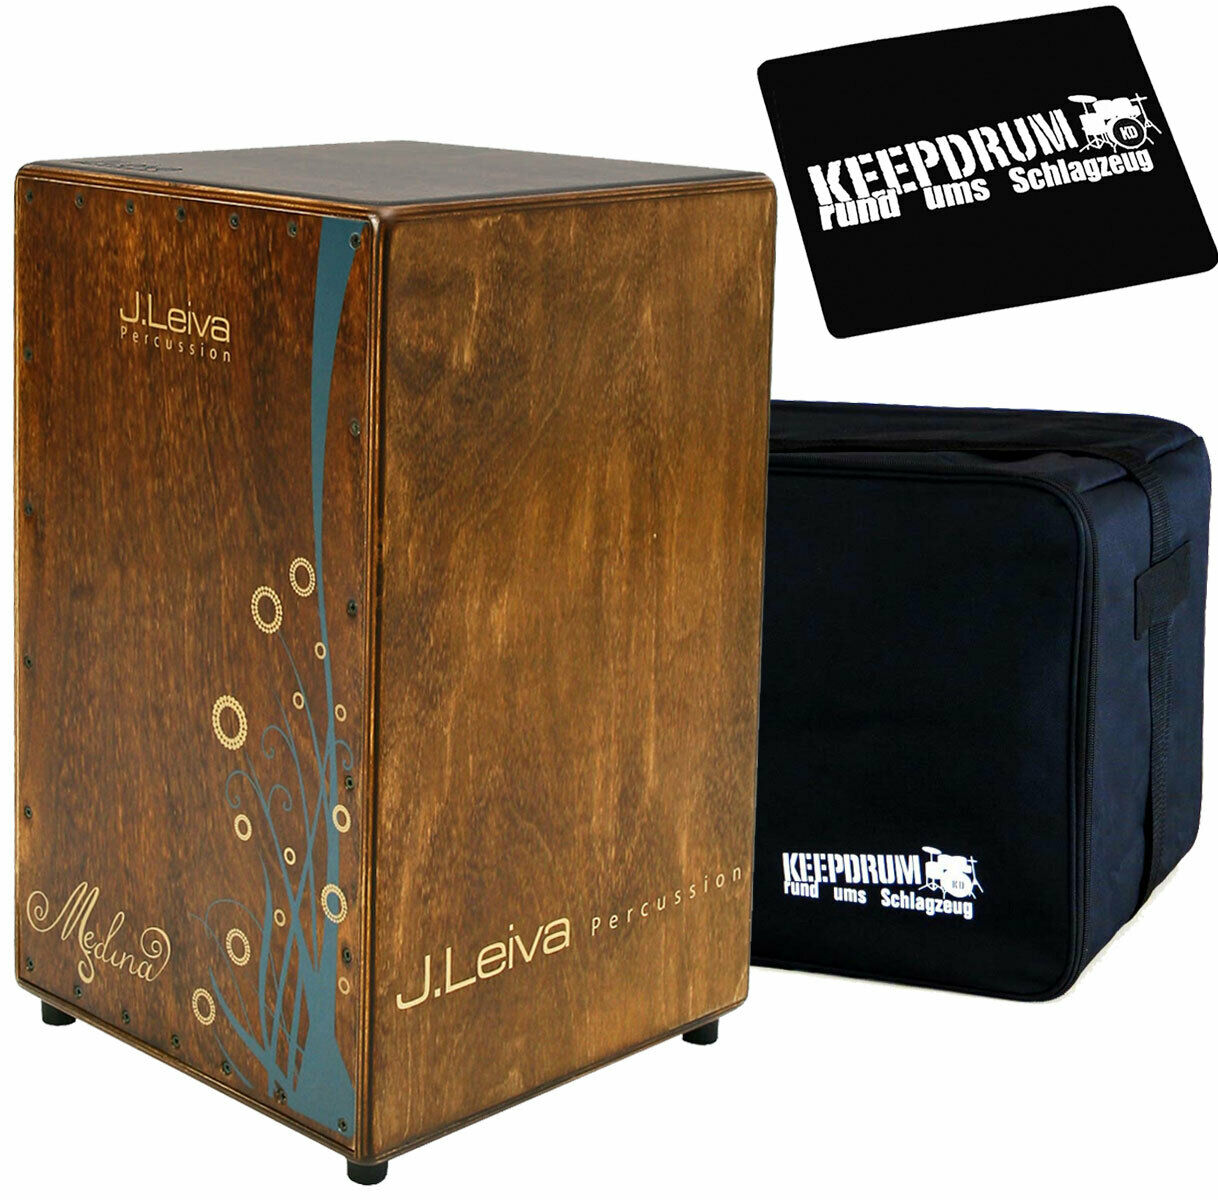 J.Leiva Medina Vintage Cajon + KEEPDRUM Tasche + Sitzpad